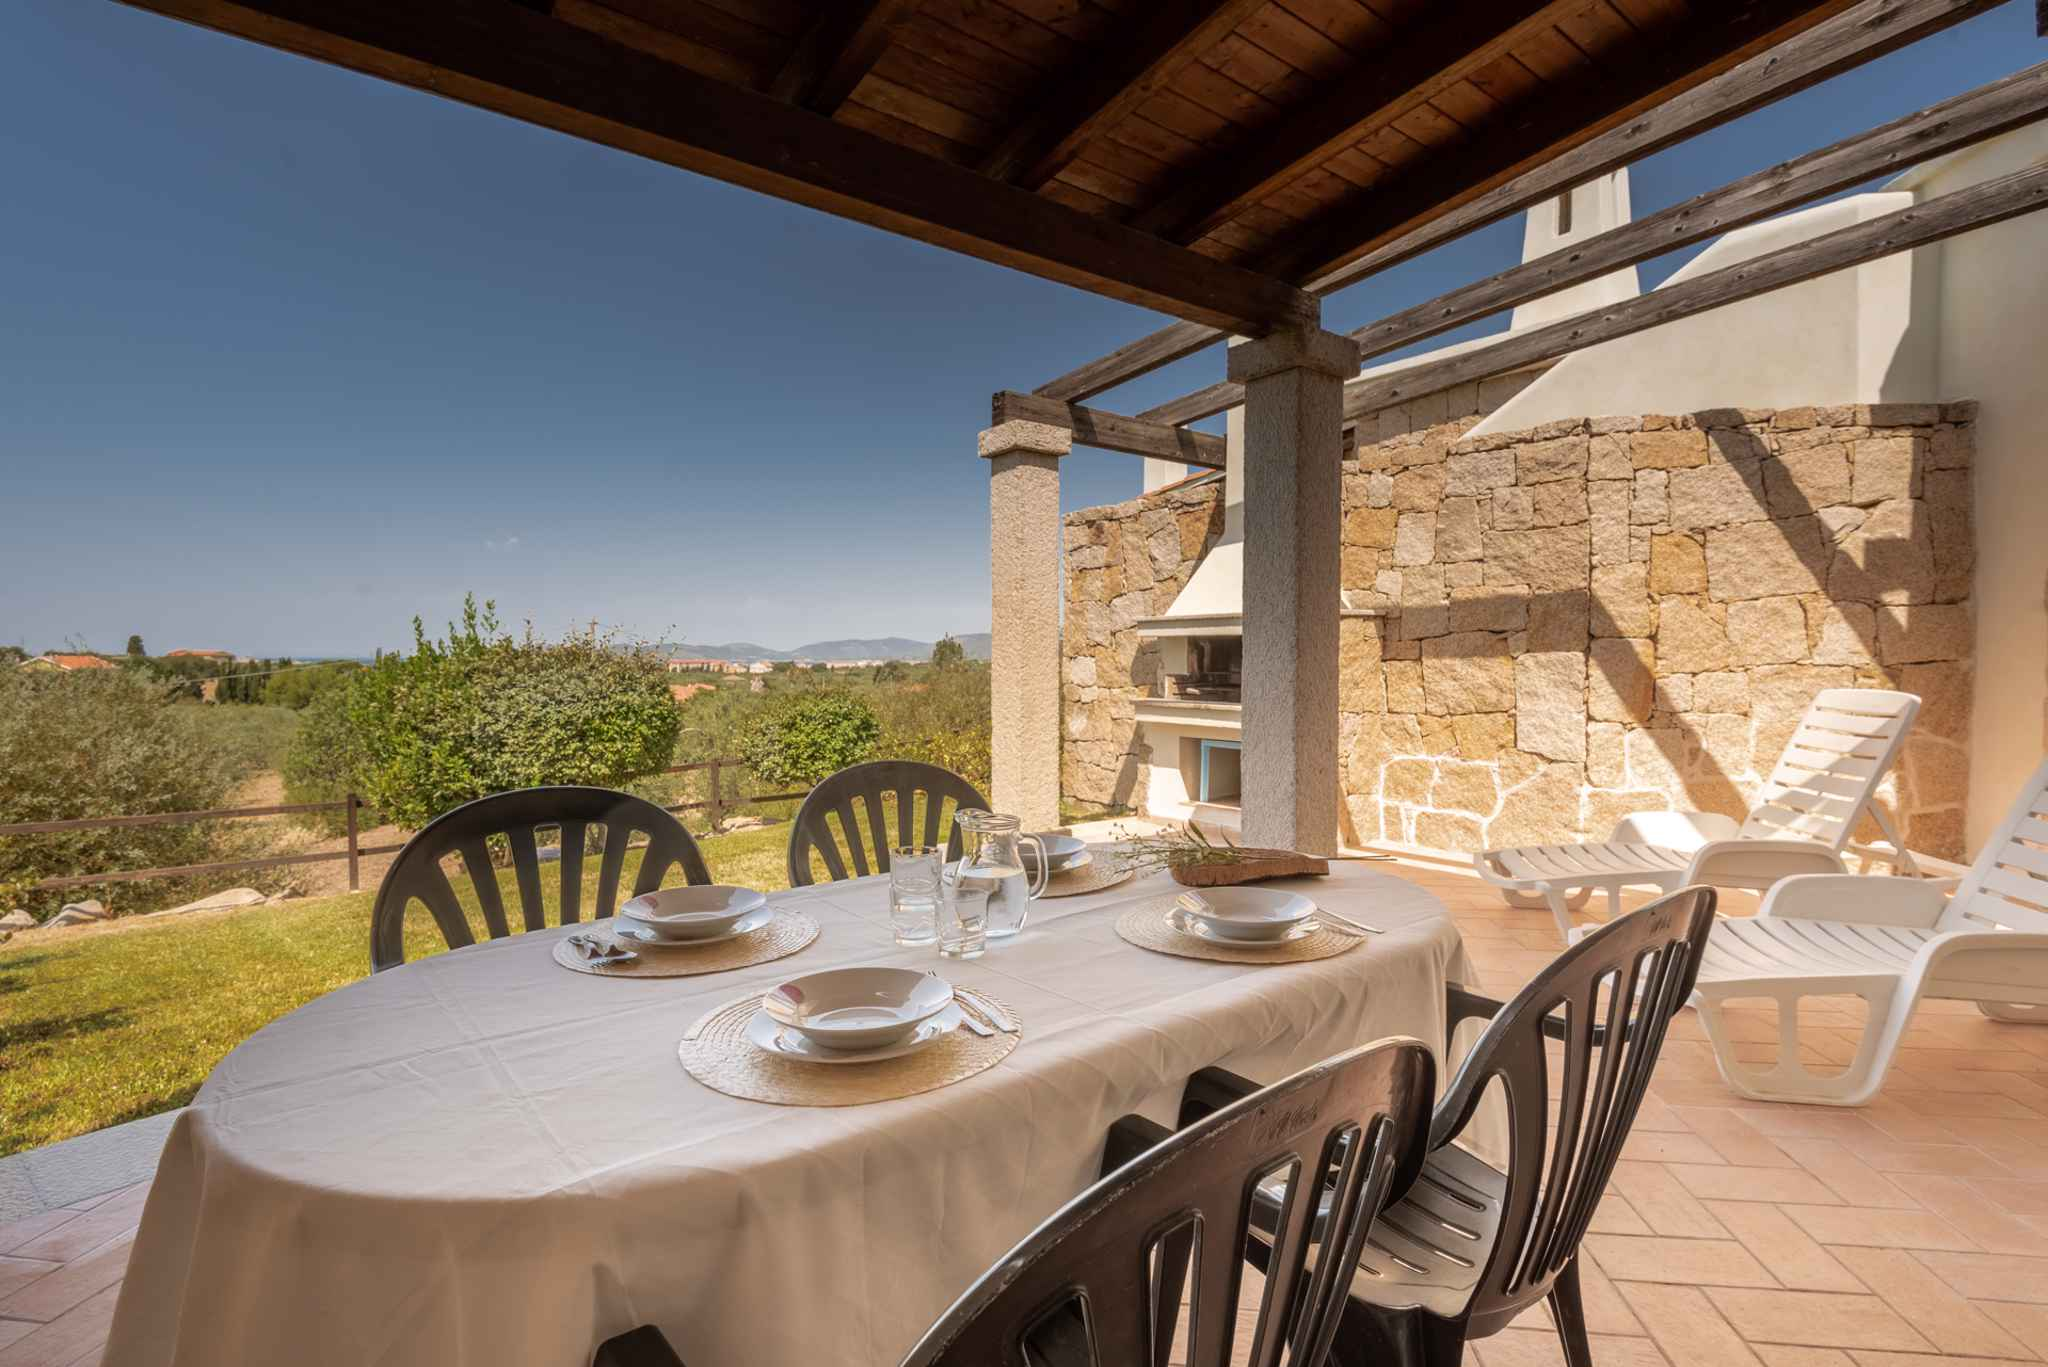 Ferienhaus con giardino (2182422), Alghero, Sassari, Sardinien, Italien, Bild 1